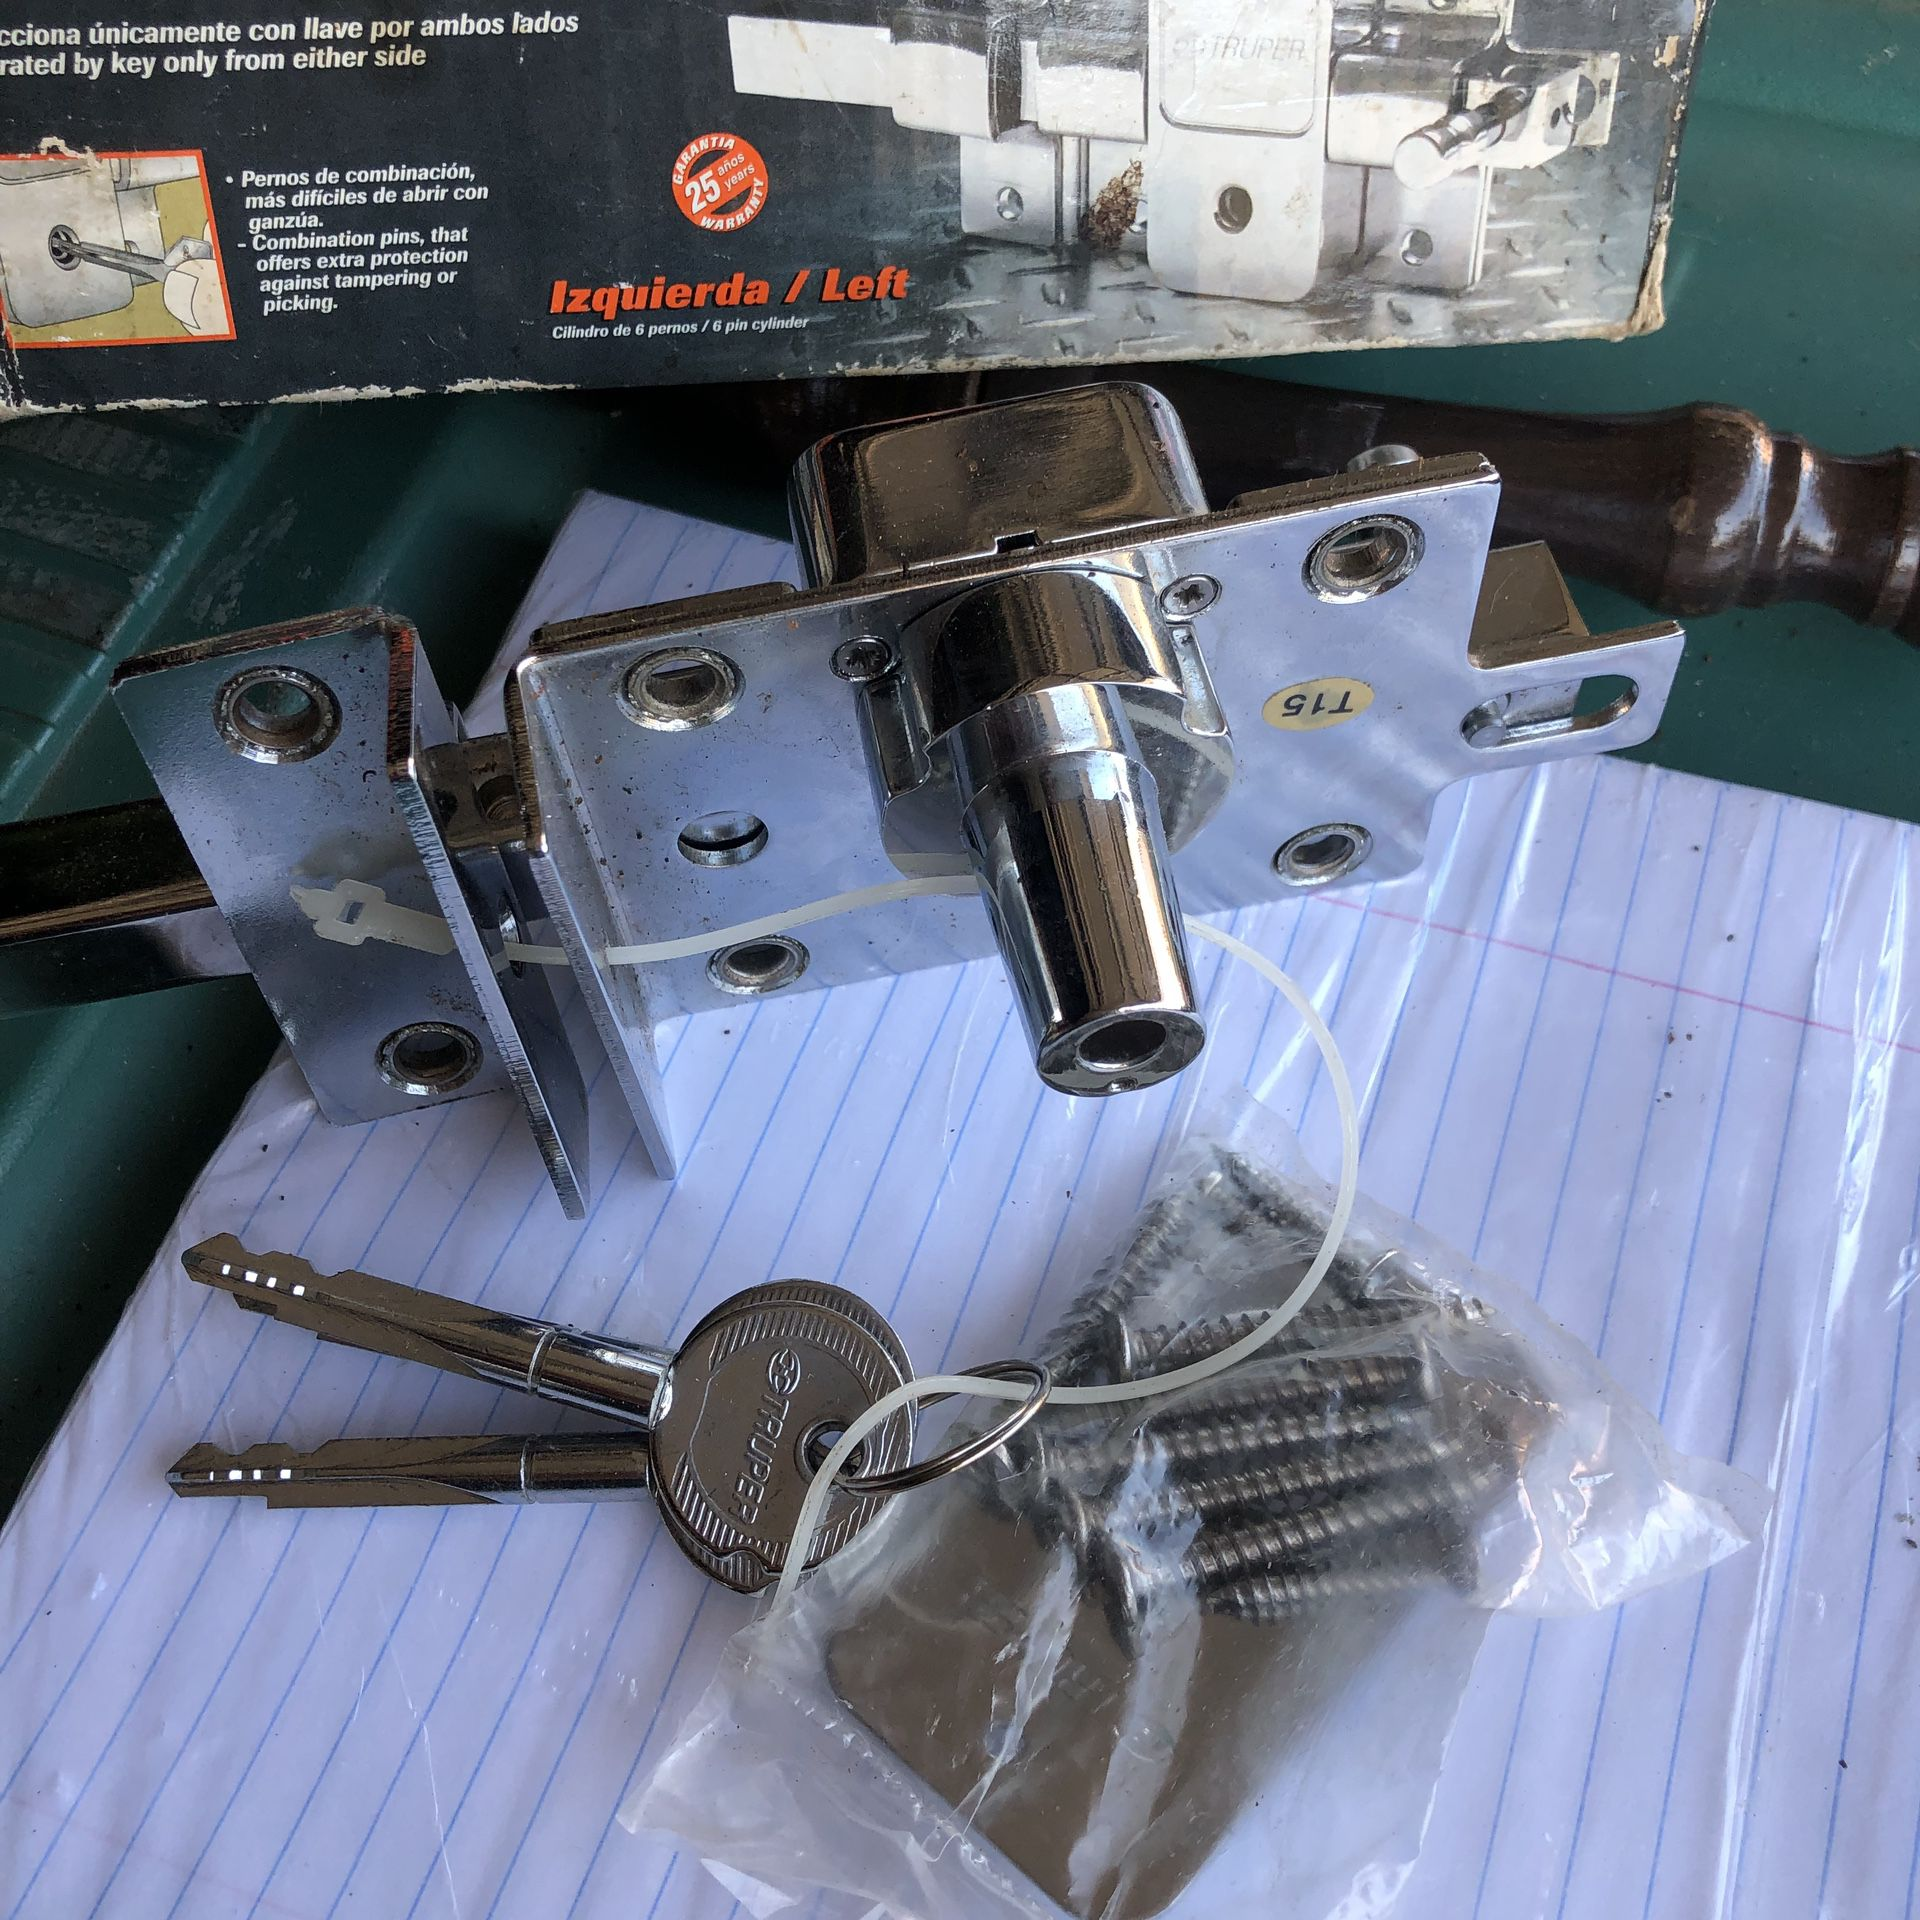 Key bolt left